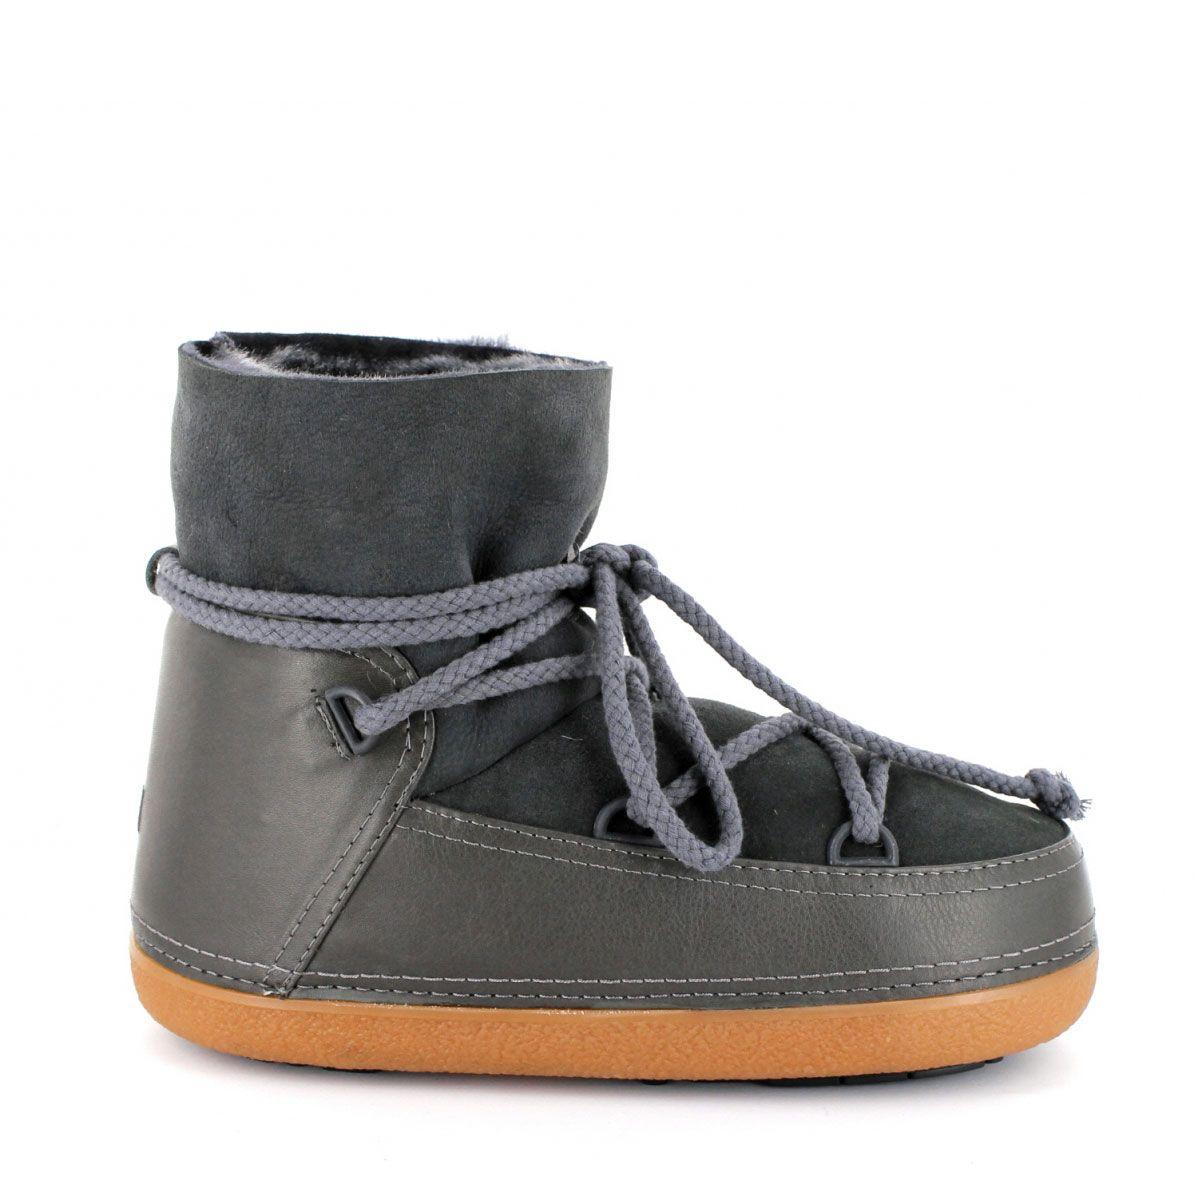 Buty Zimowe Ikkii Shoes Minimalist Fashion Baby Shoes